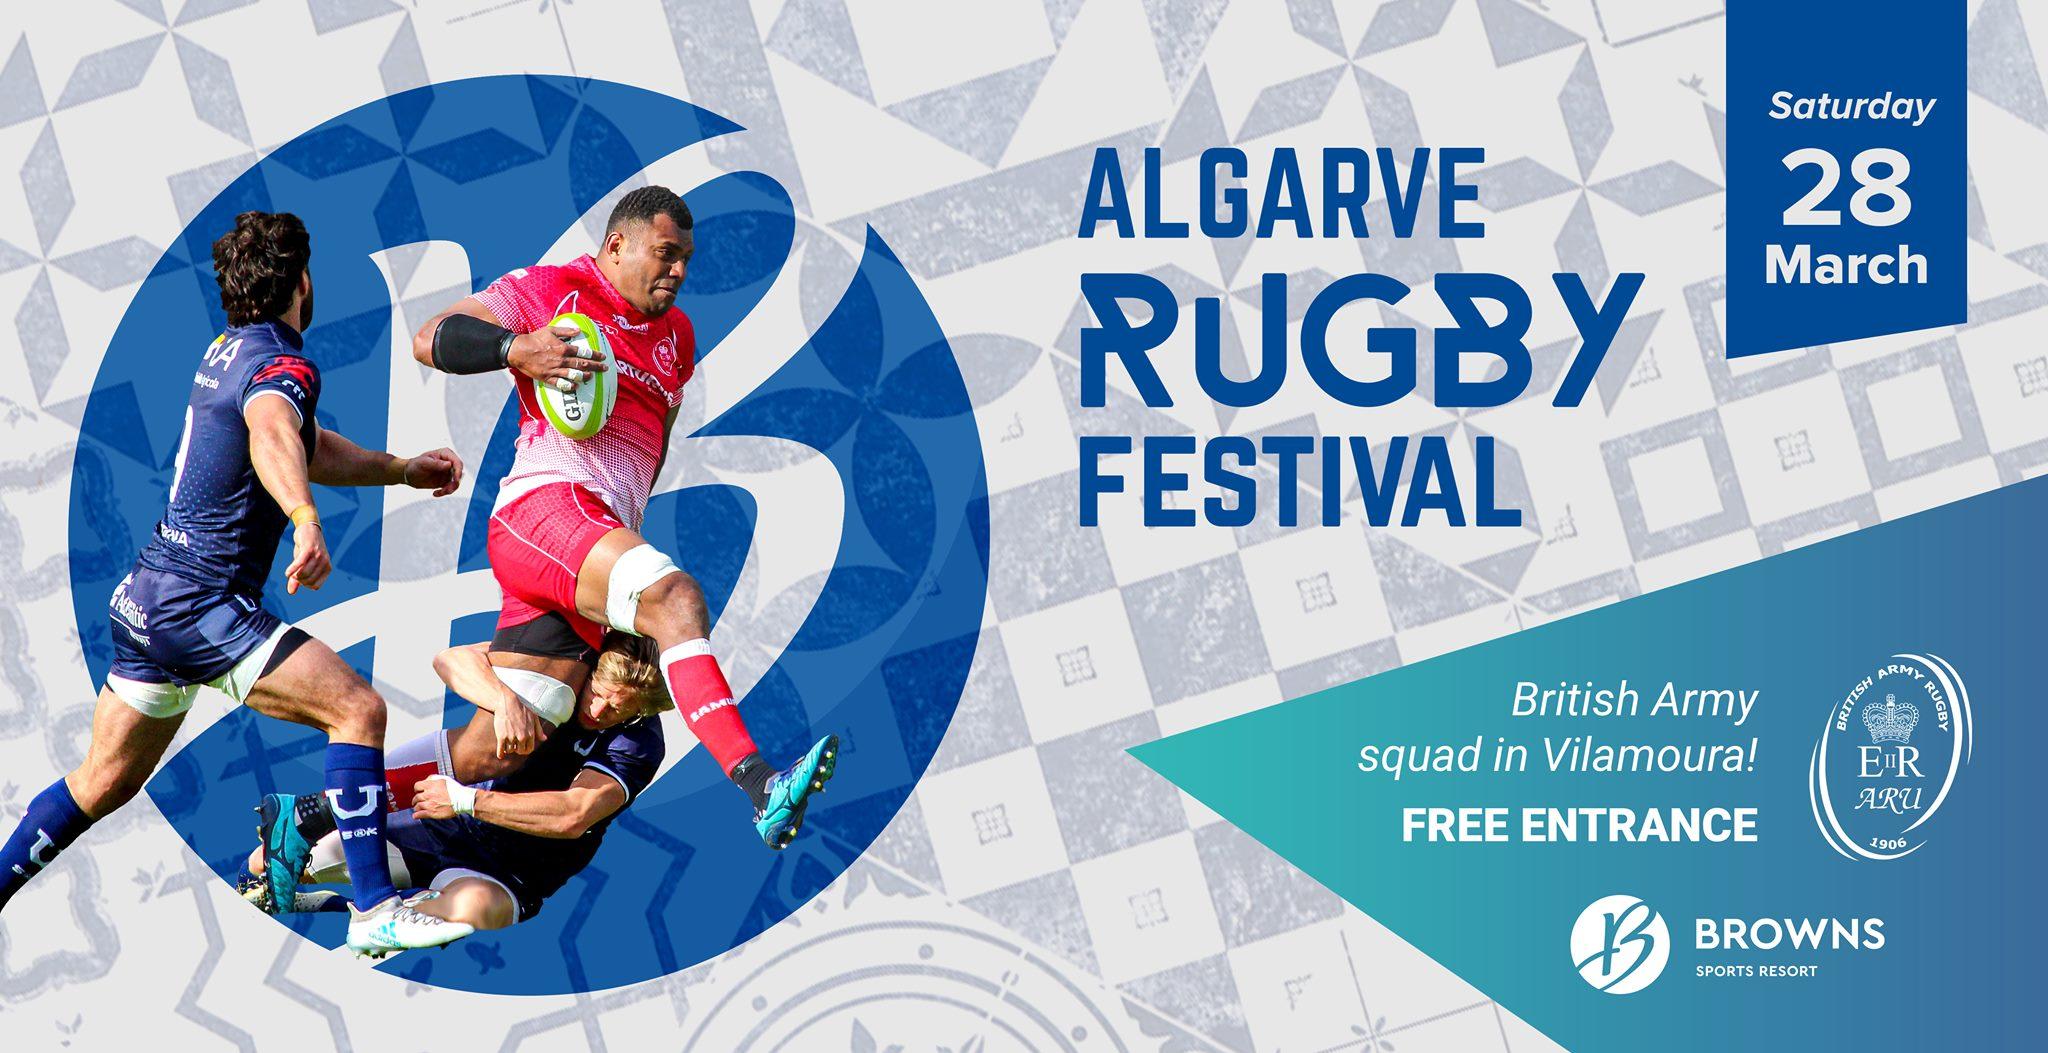 Algarve Rugby Festival